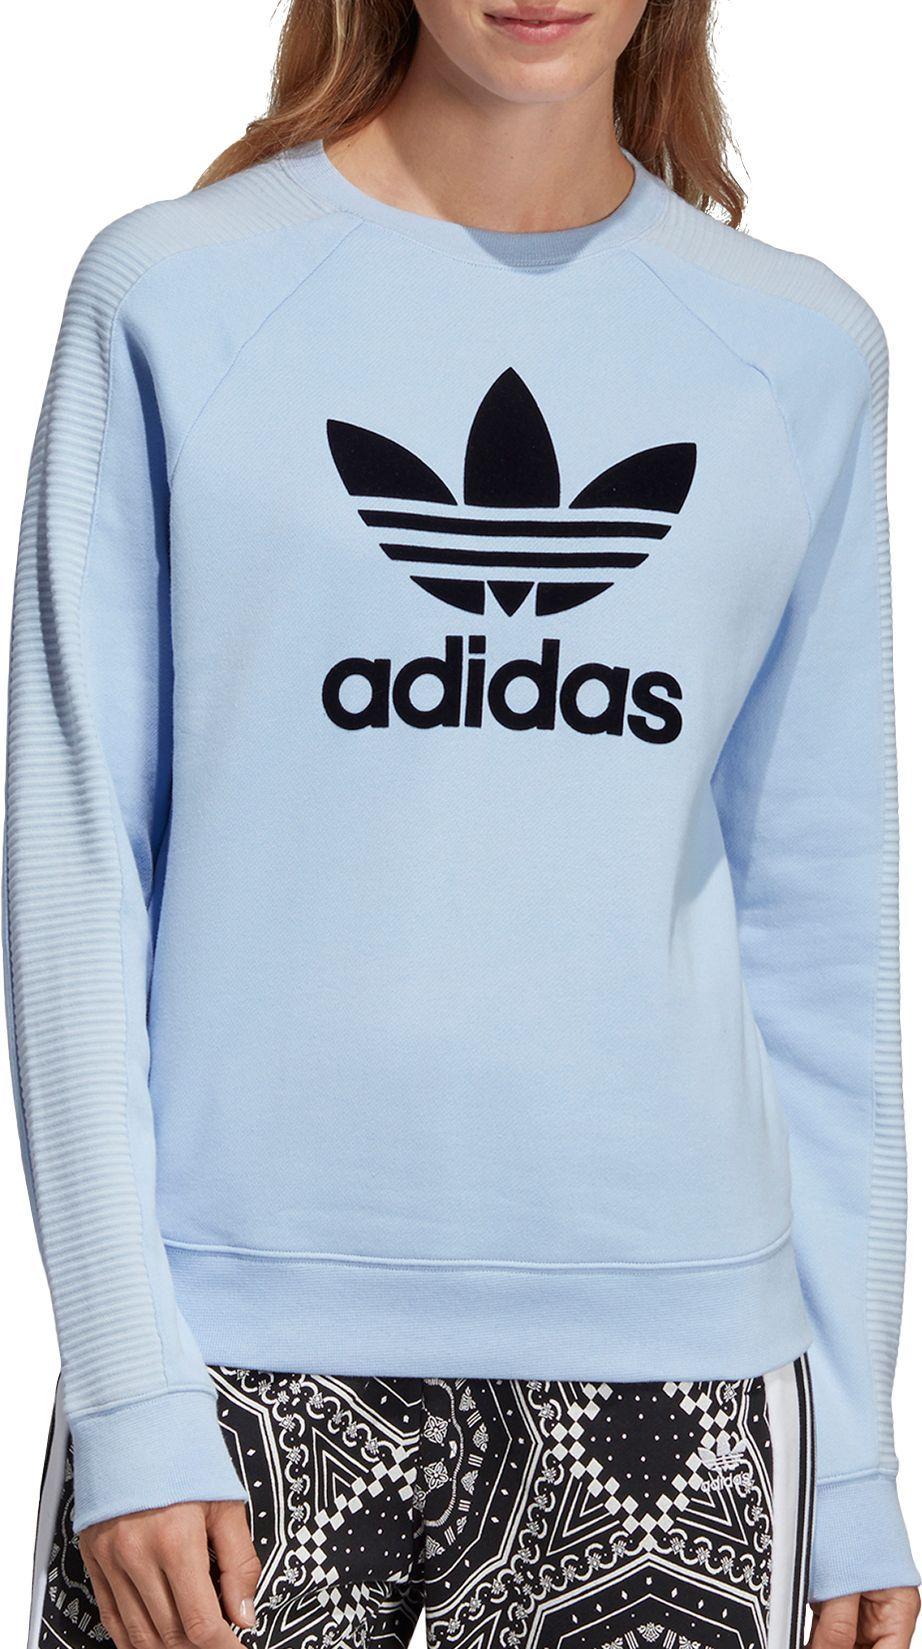 Adidas Originals Adicolour Oversized Crew Neck Sweatshirt With Trefoil Logo At Asos Com Trendy Sweatshirt Crewneck Sweatshirt Women Sweatshirt Outfit [ 1110 x 870 Pixel ]